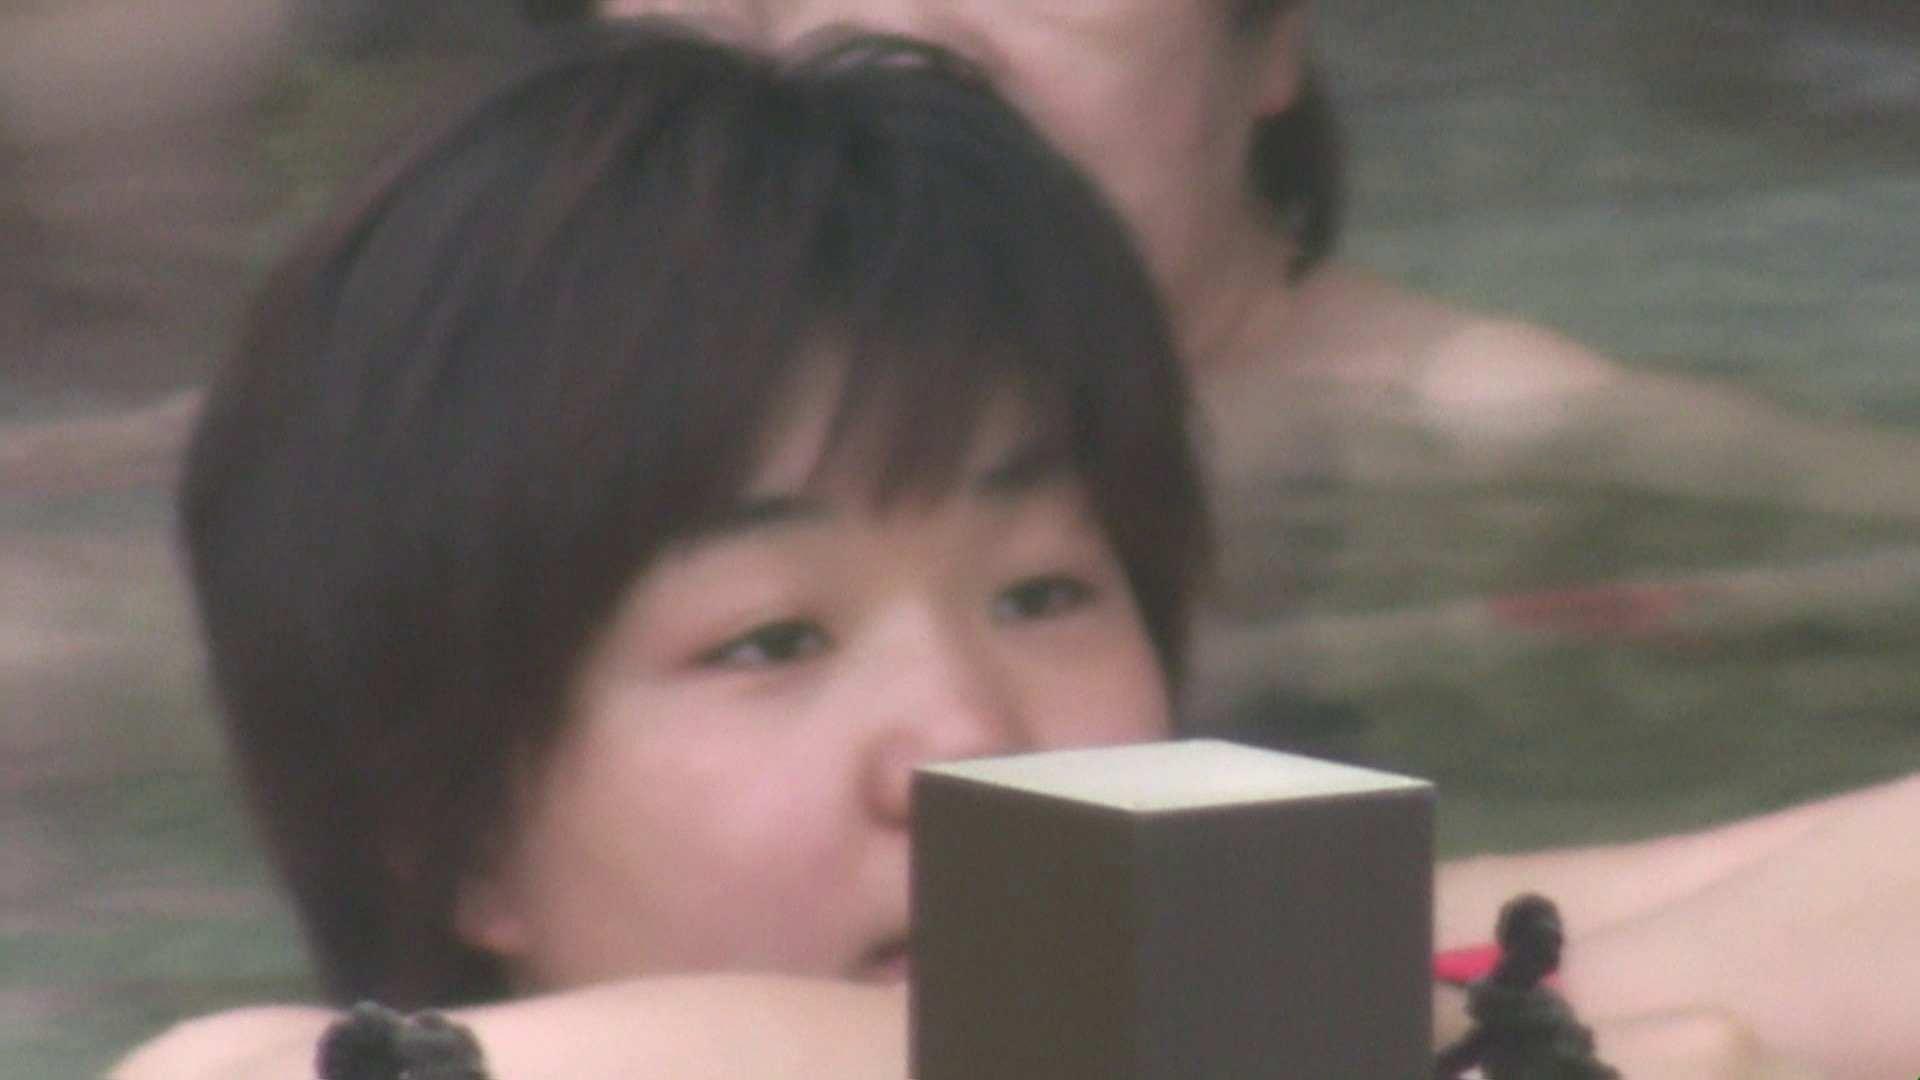 Aquaな露天風呂Vol.53【VIP限定】 露天風呂編   盗撮シリーズ  76PIX 33